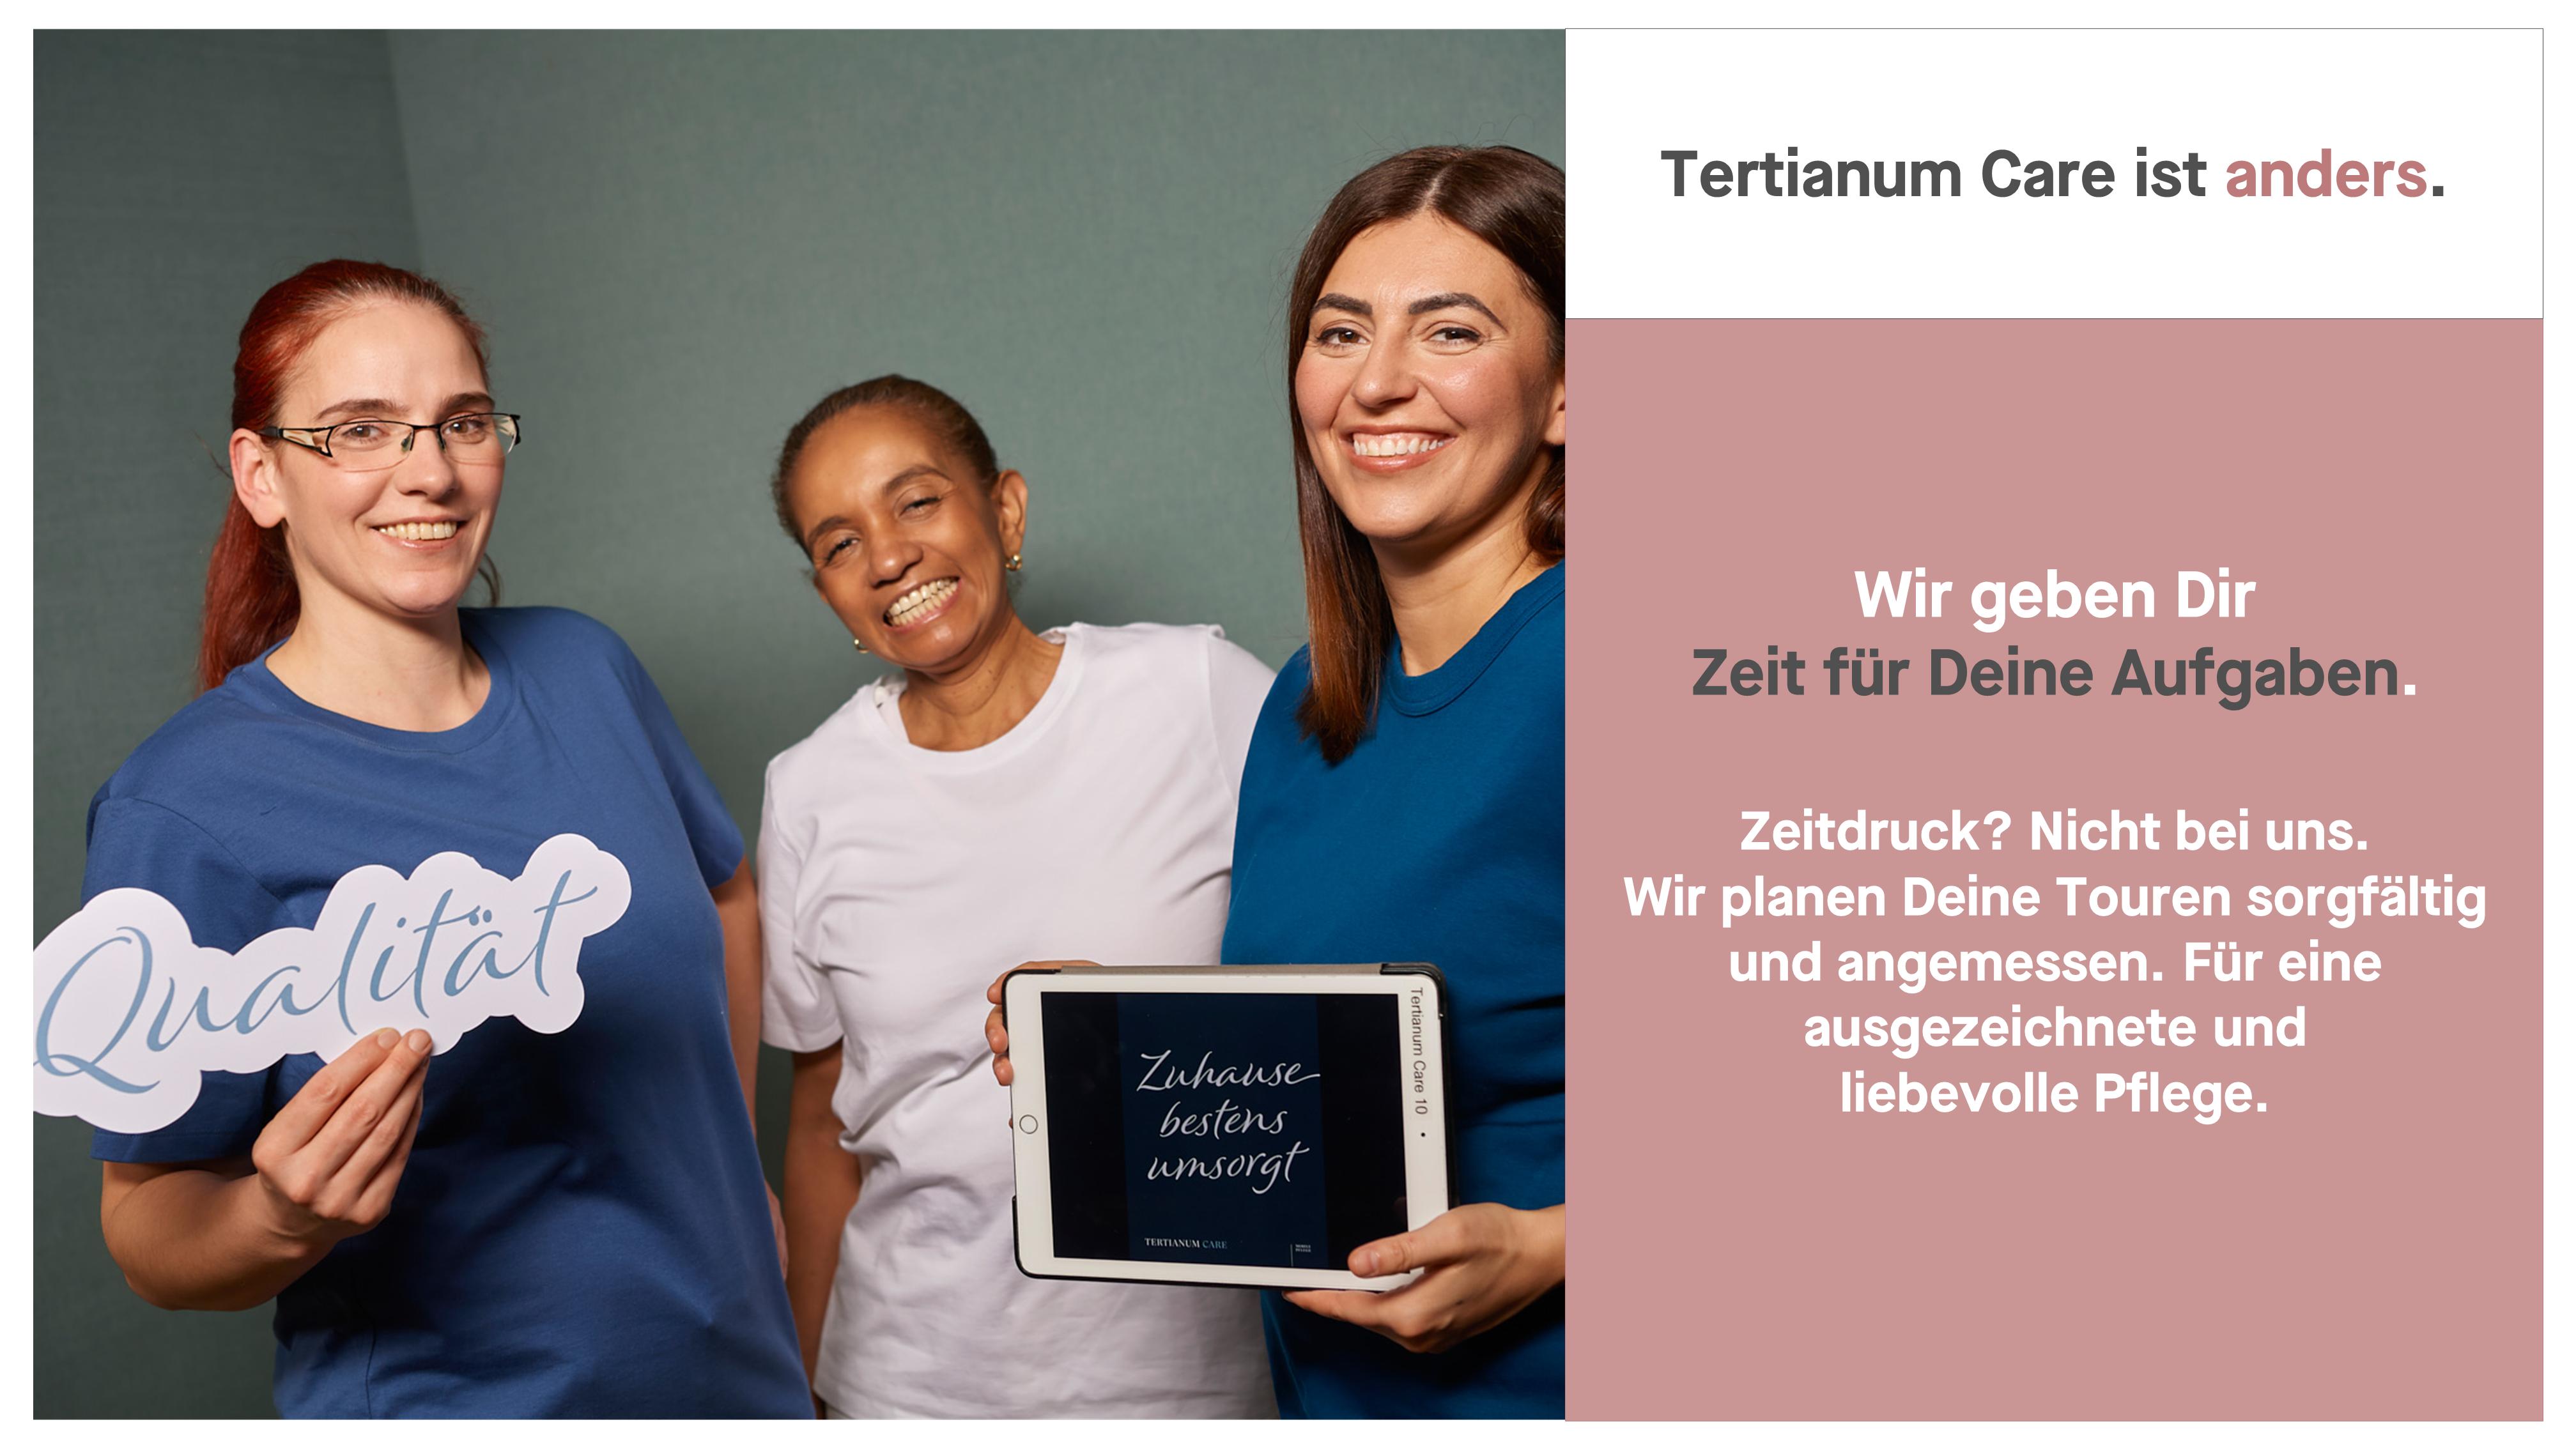 Tertianum Care ist anders